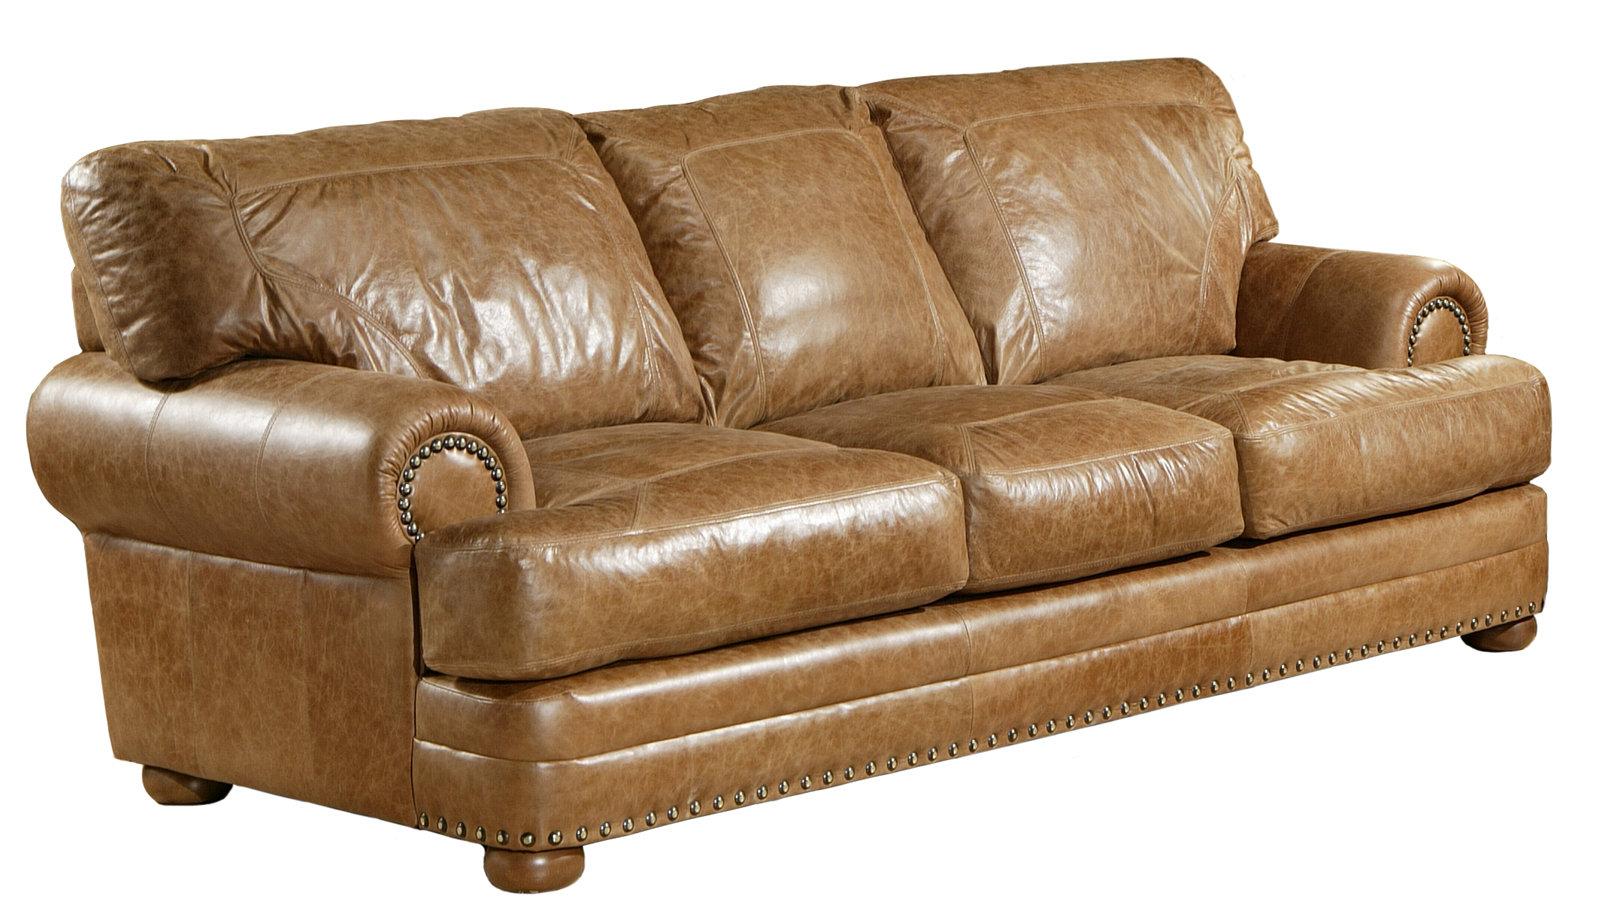 Omnia Leather Houston Leather Sleeper Sofa Wayfair